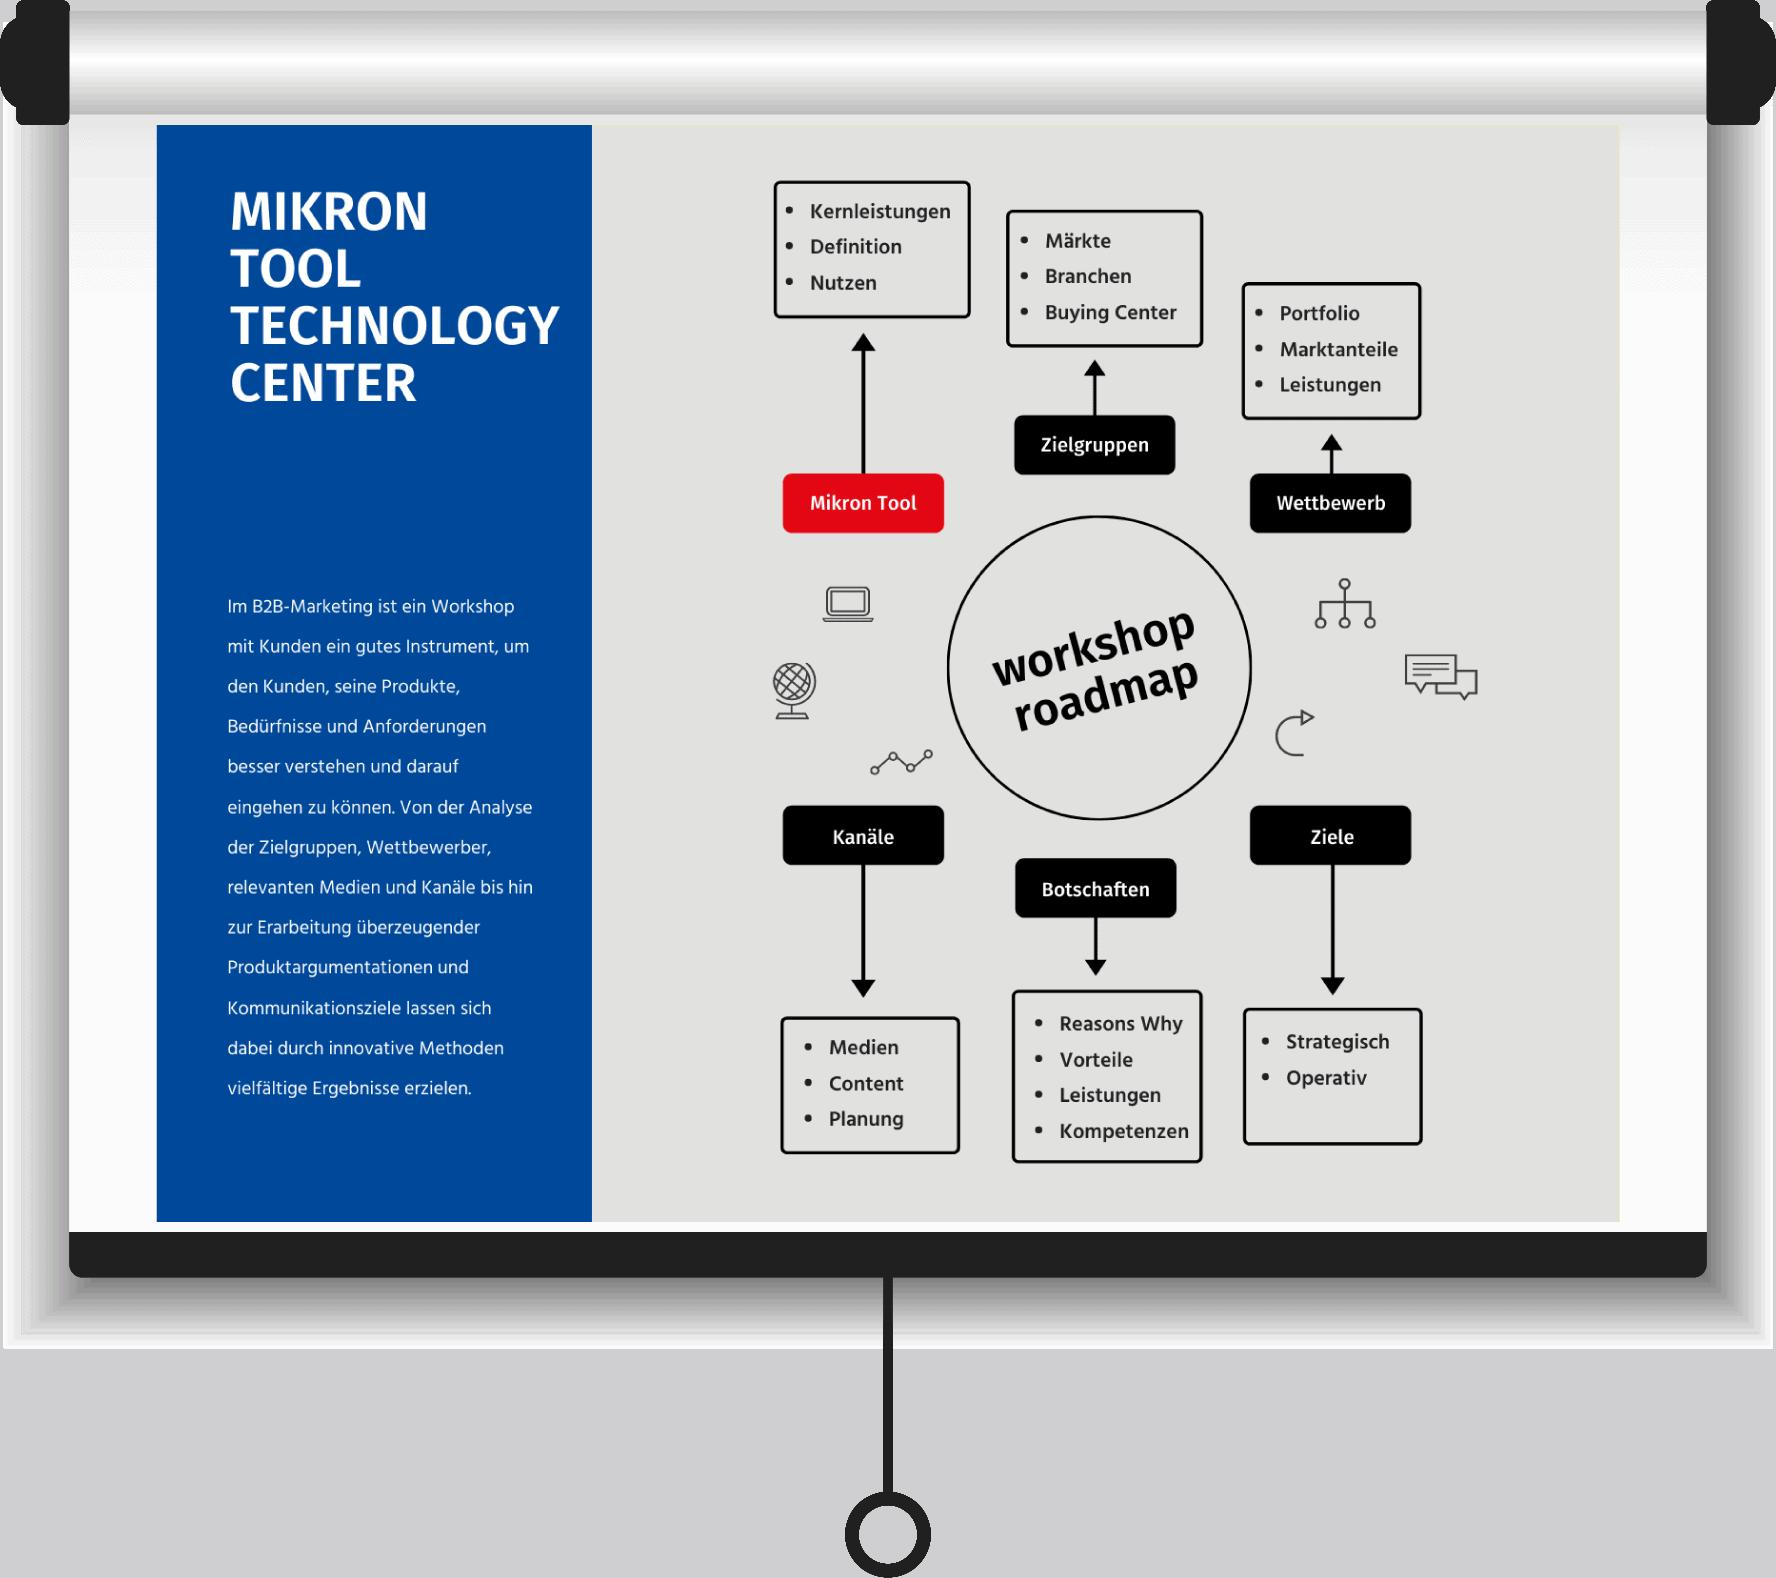 mikron-tool-workshop-roadmap